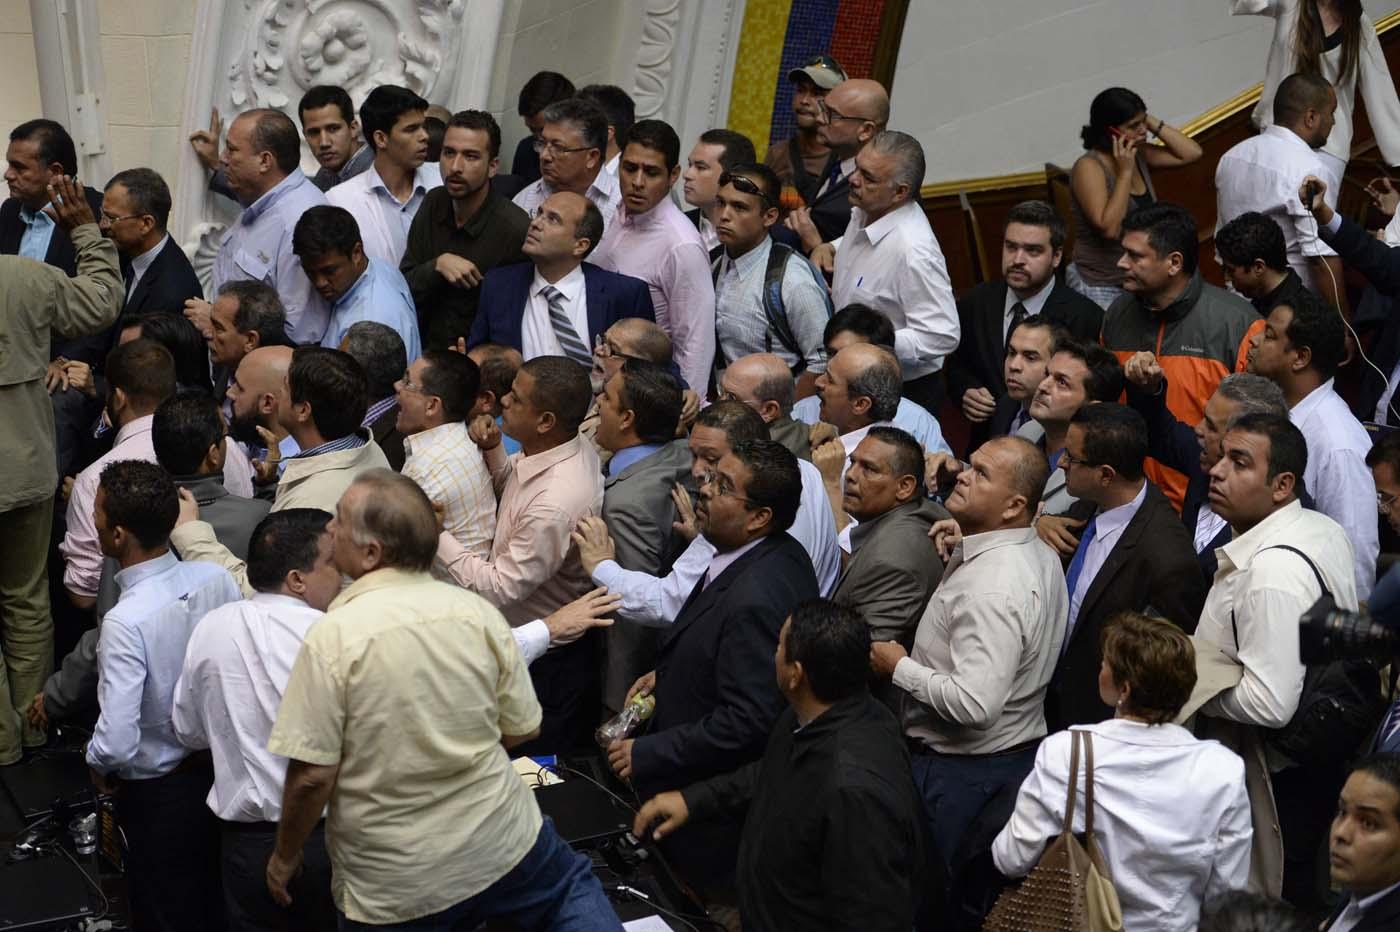 Gobierno de Nicolas Maduro. - Página 18 000_HF3CA